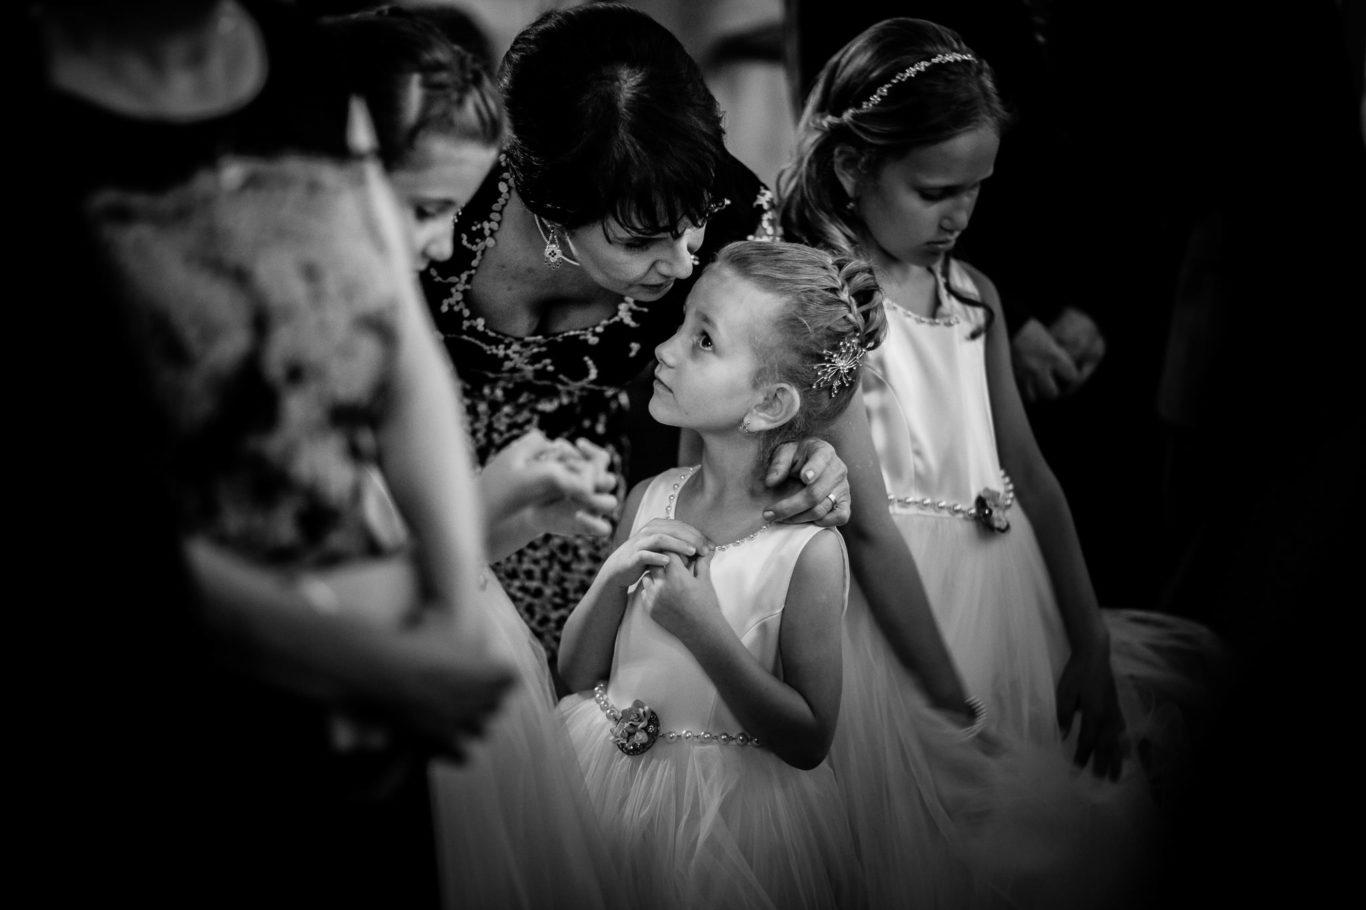 0437-Fotografie-nunta-Simona-Valentin-fotograf-Ciprian-Dumitrescu-CDF_9244